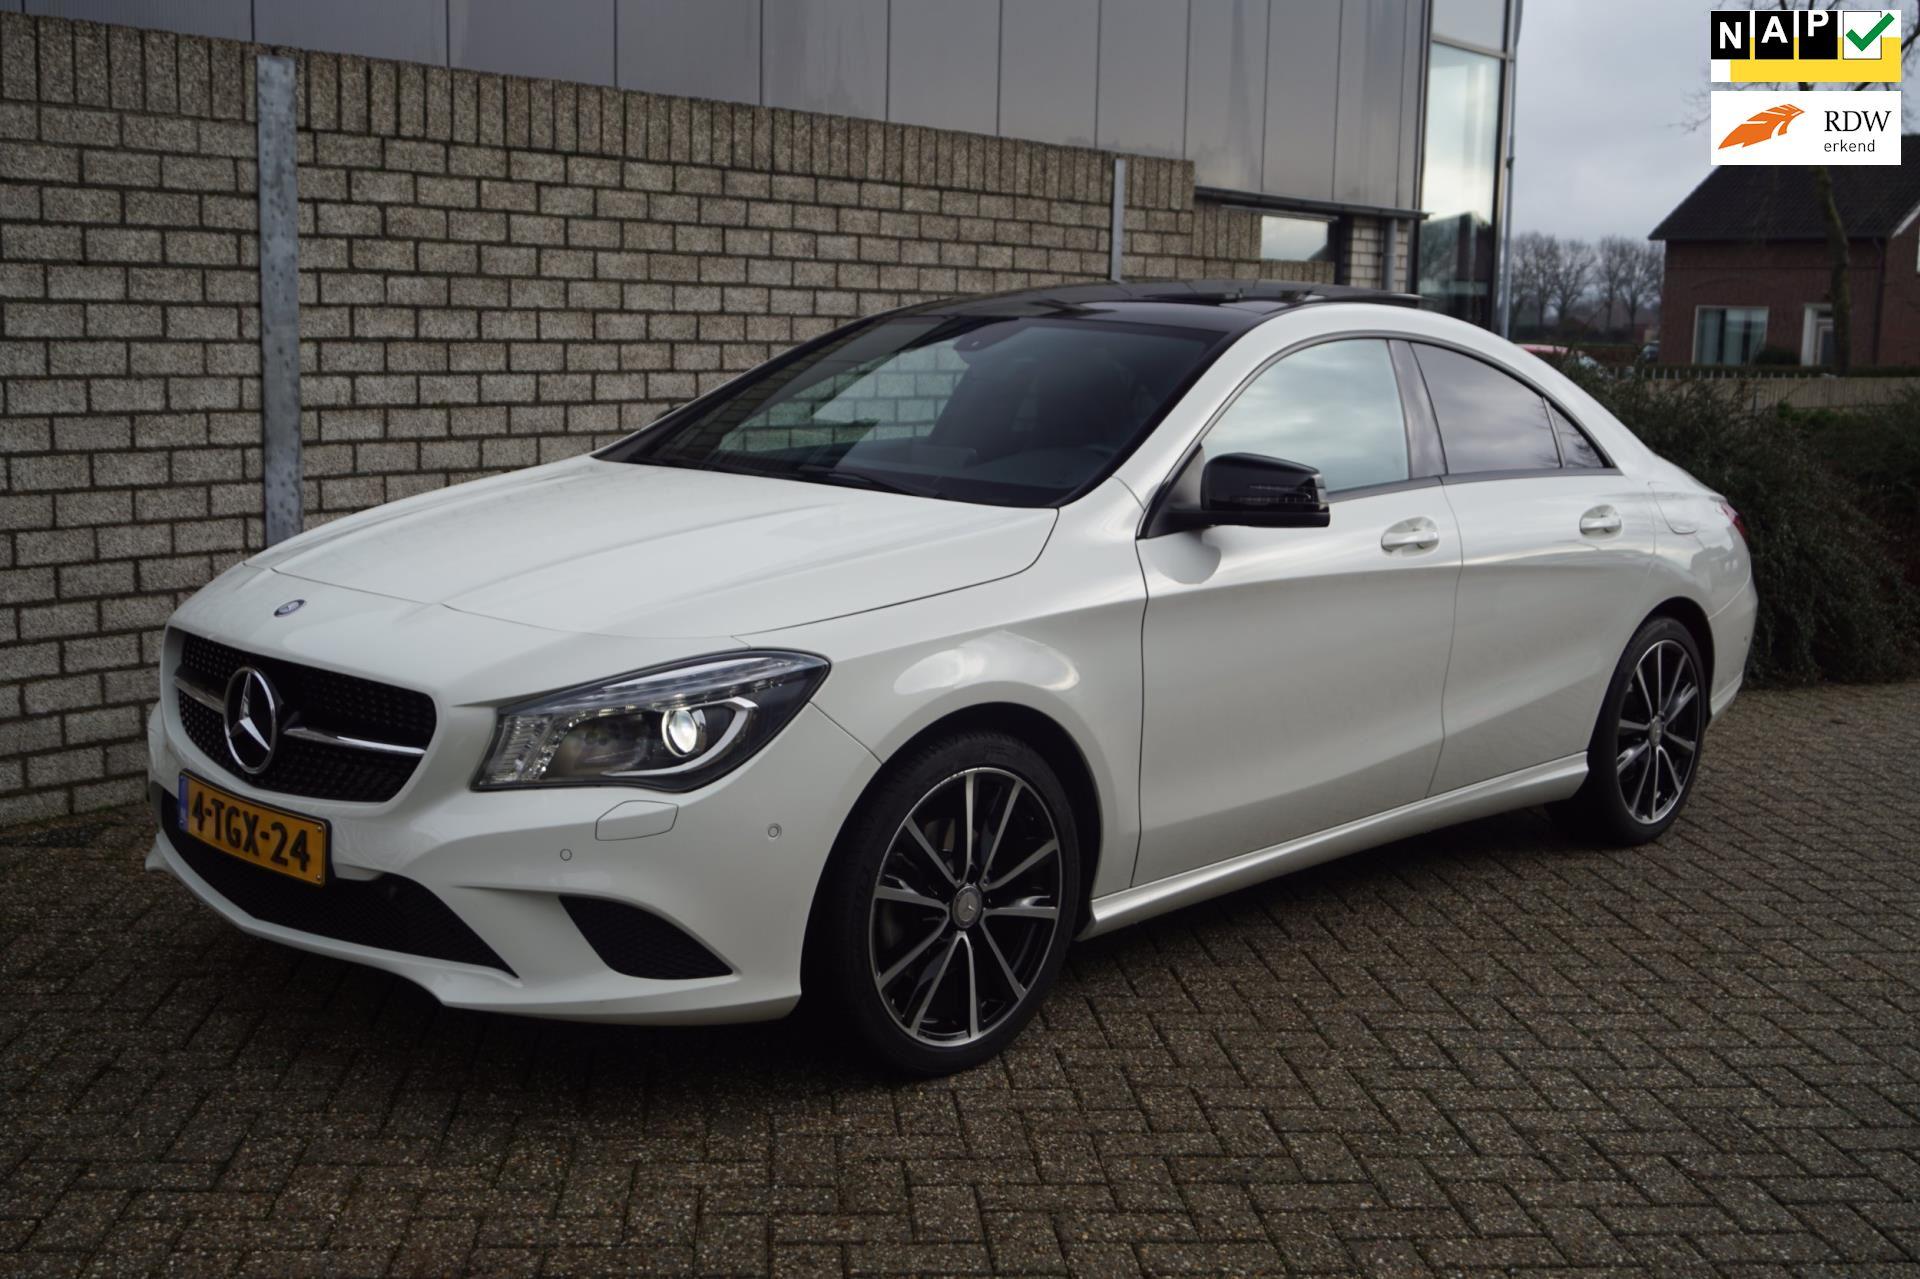 Mercedes-Benz CLA-klasse occasion - Autobedrijf H. Wijdeven V.o.f.